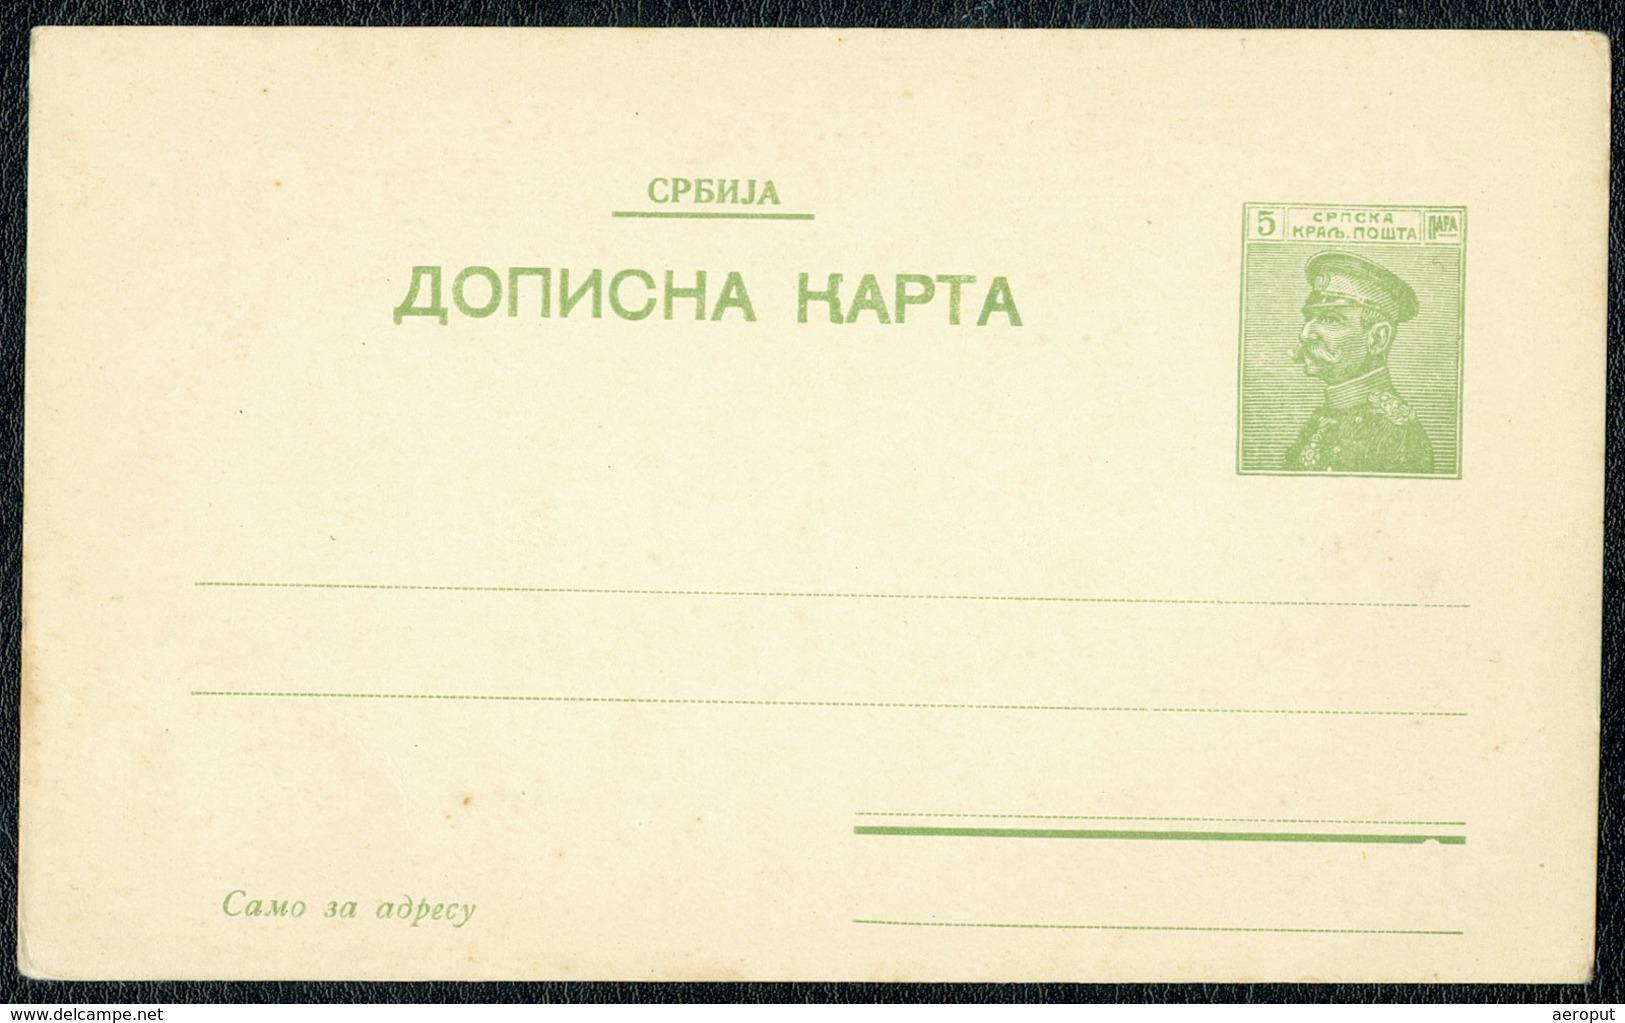 SERBIA Postal Stationery Card - Carte Postale - 5 Para, King Peter I (1911) - Unused #3 - Serbia